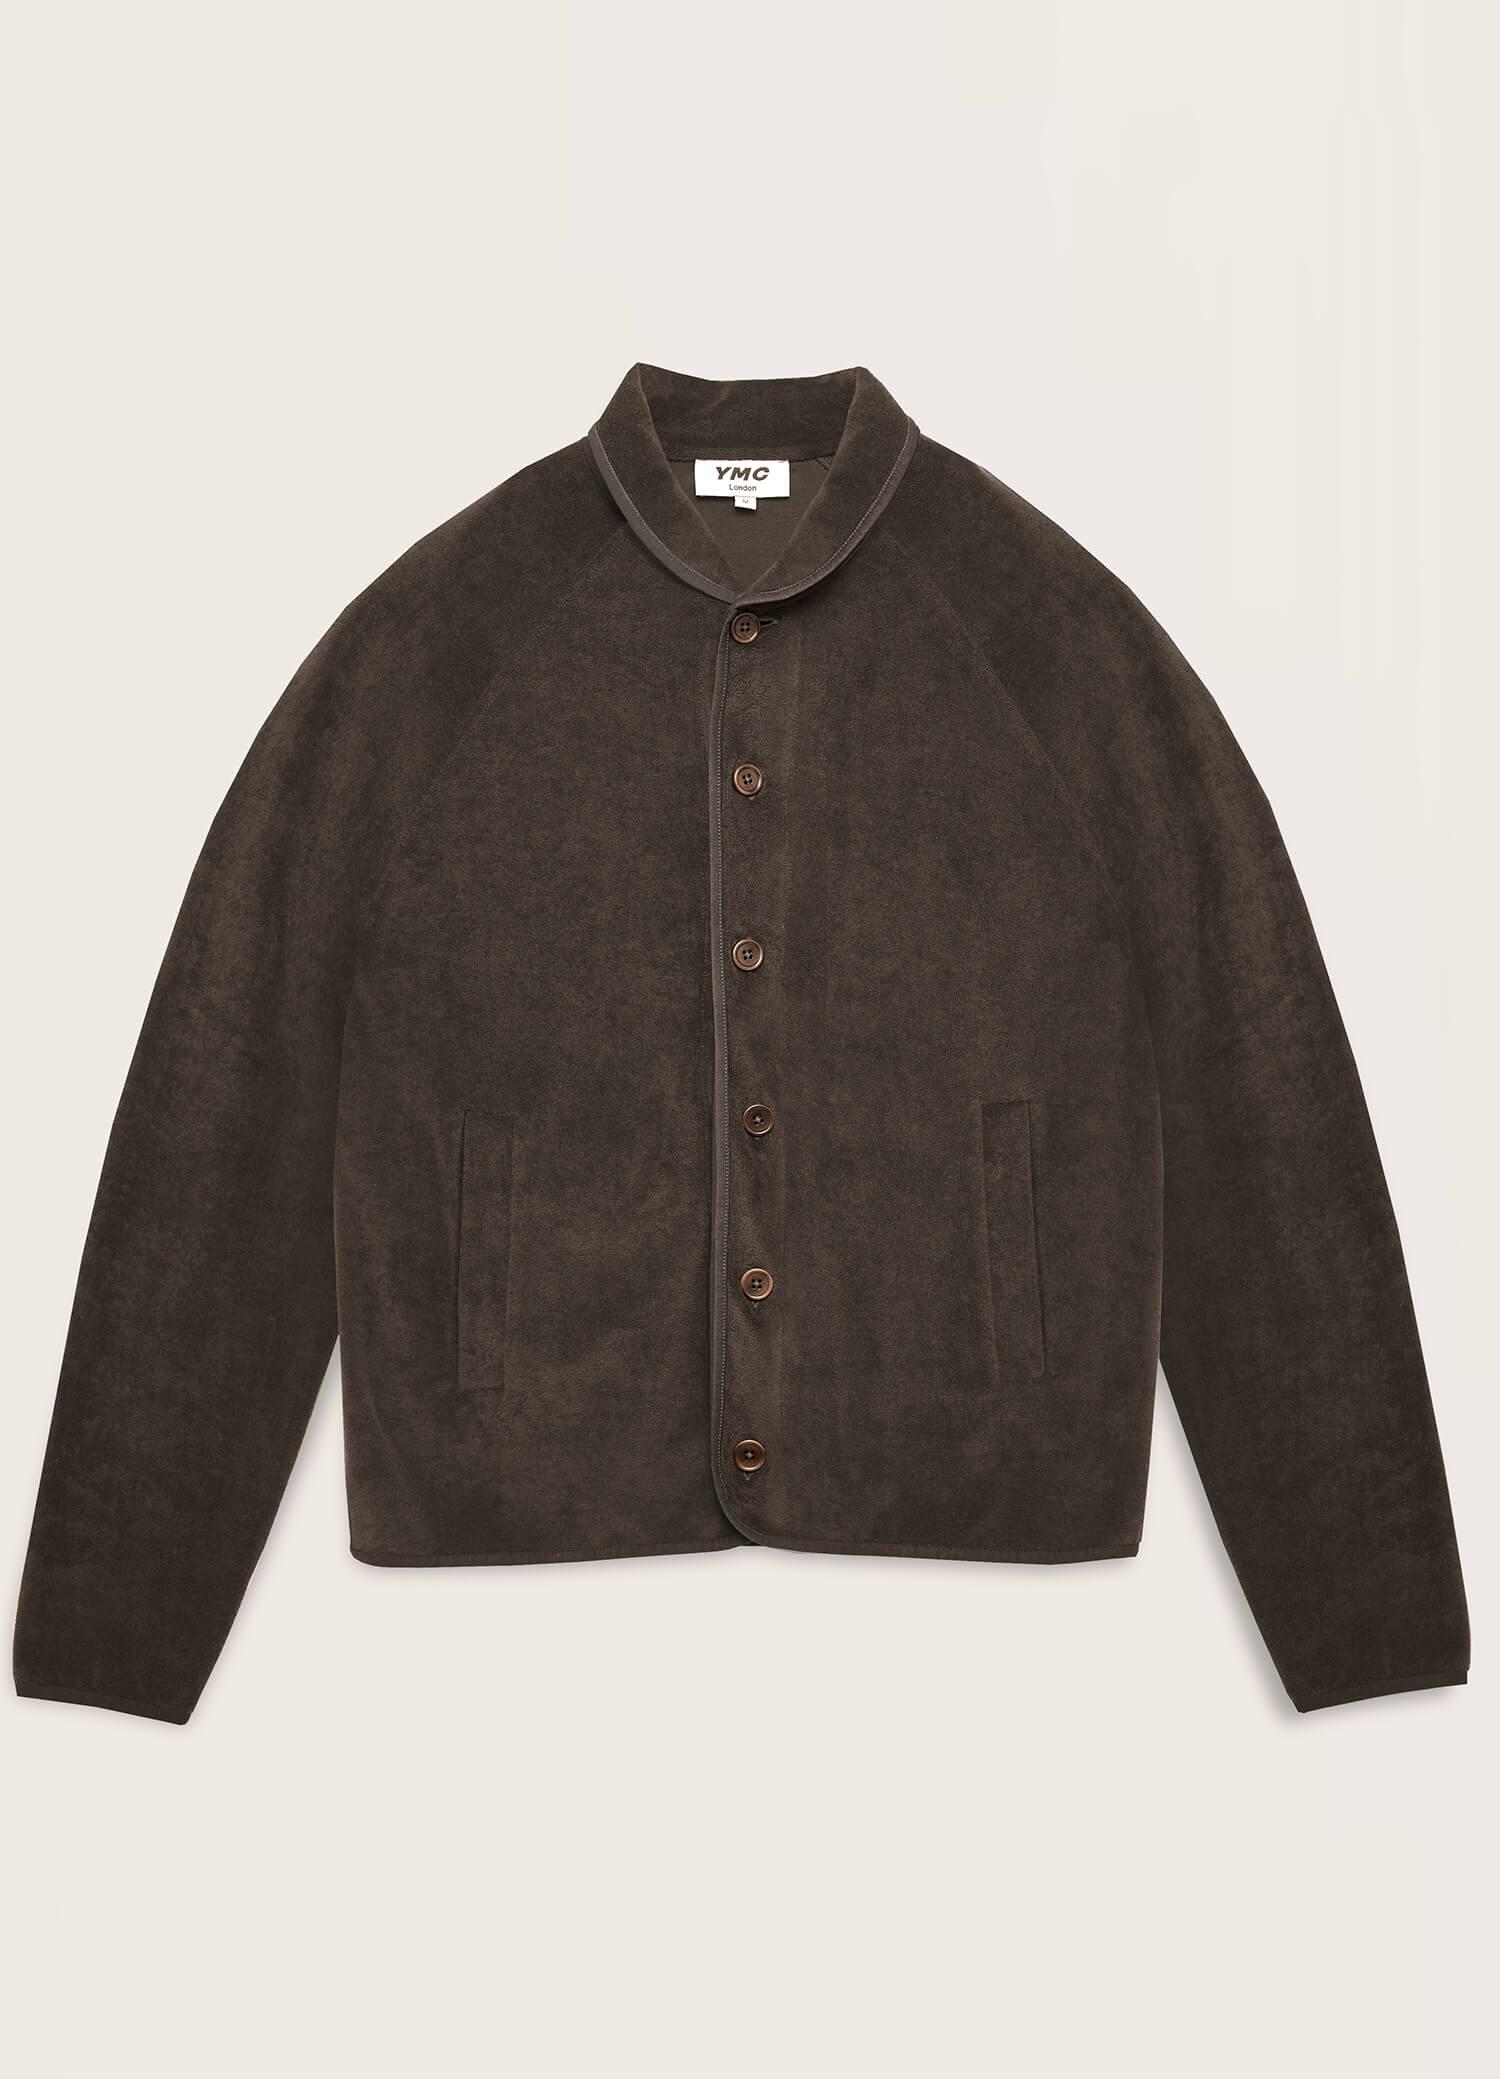 Beach Cotton Towelling Jacket Black Olive